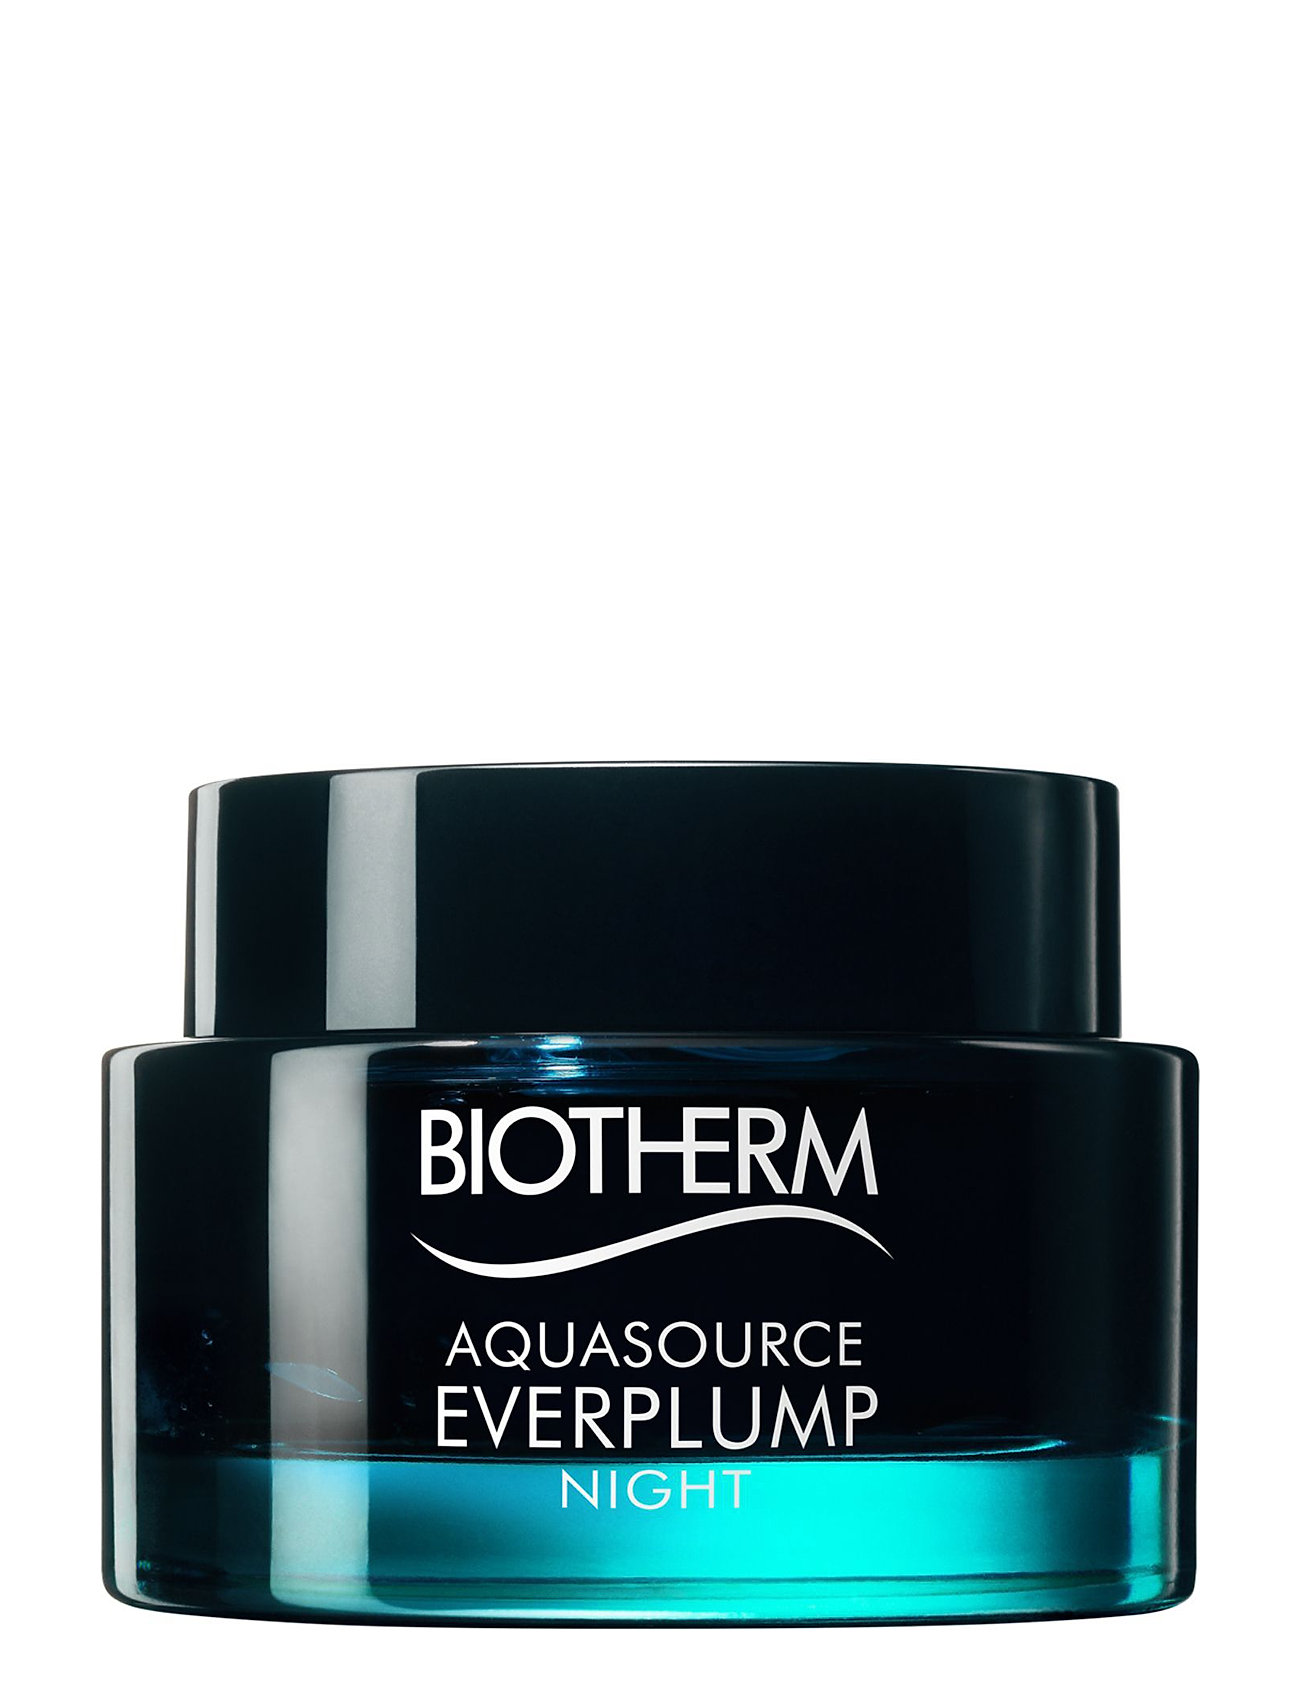 biotherm – Aquasource everplump night 75 ml fra boozt.com dk